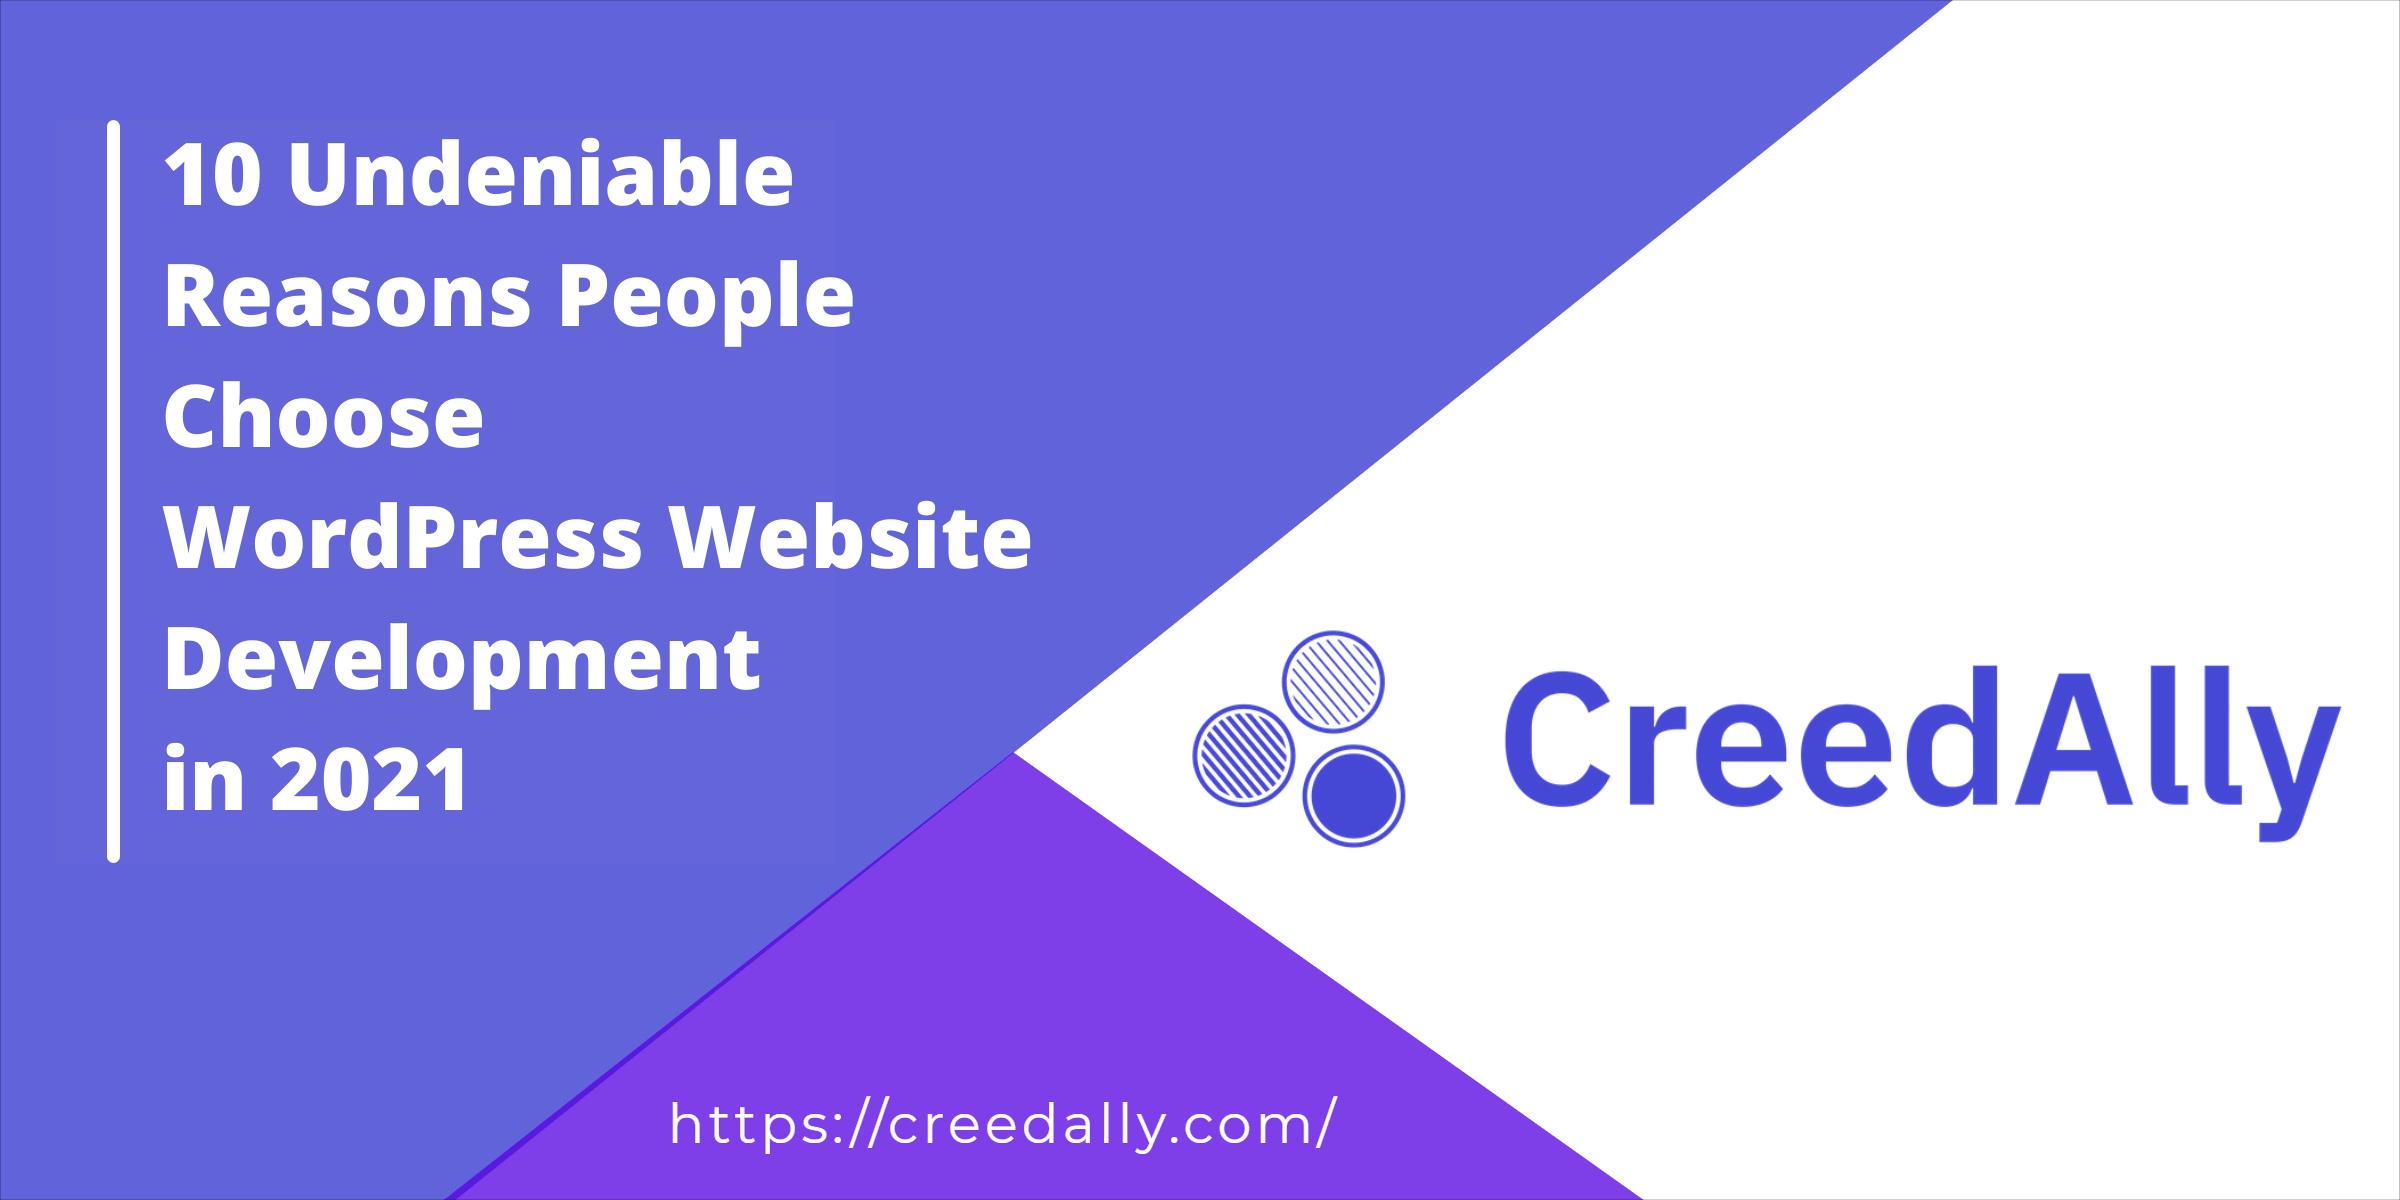 10 Undeniable Reasons People Choose WordPress Website Development in 2021